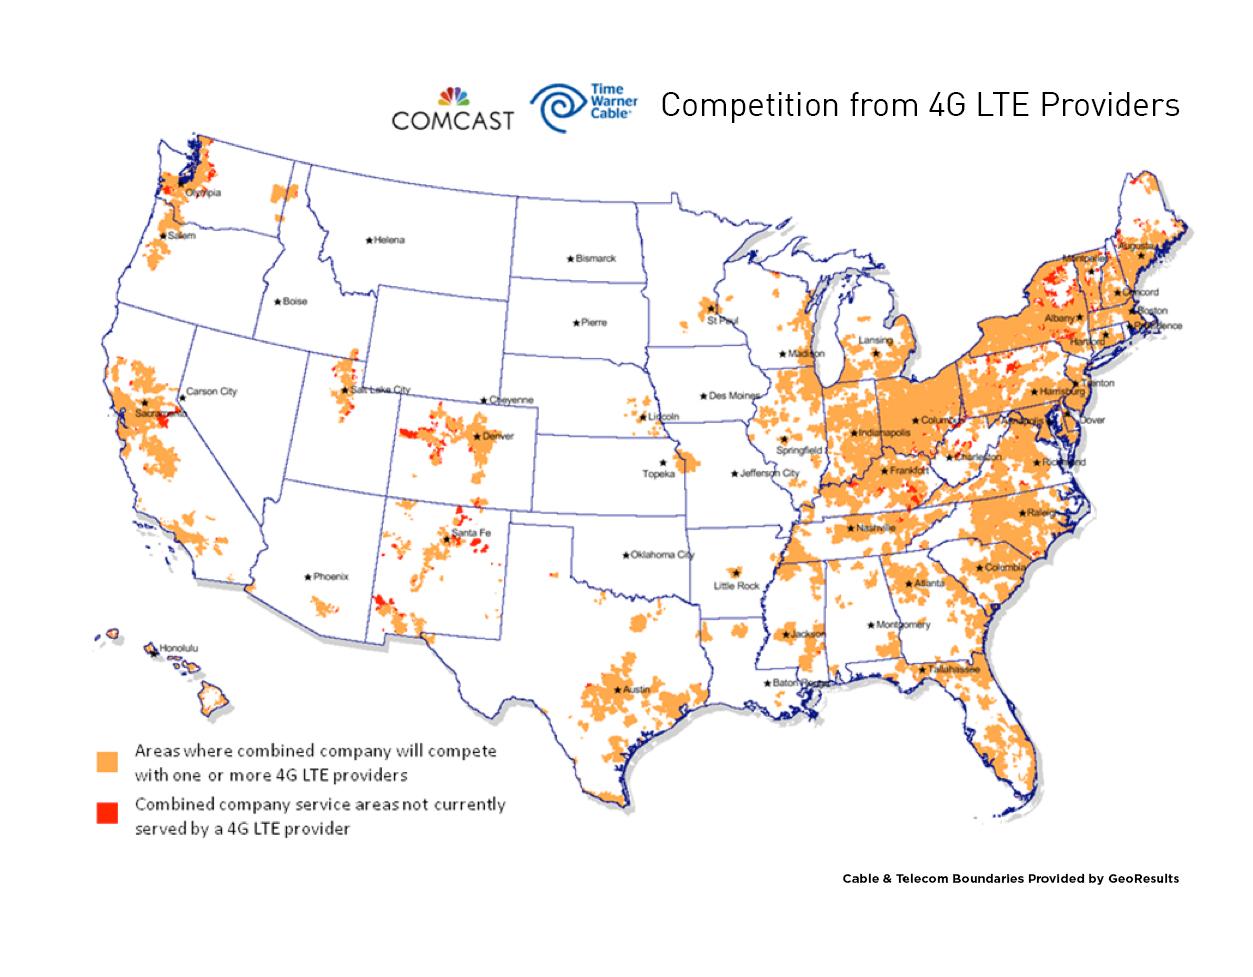 Image Large Dlc Blog Vintage Comcast Coverage Map - Comcast Coverage Map Texas